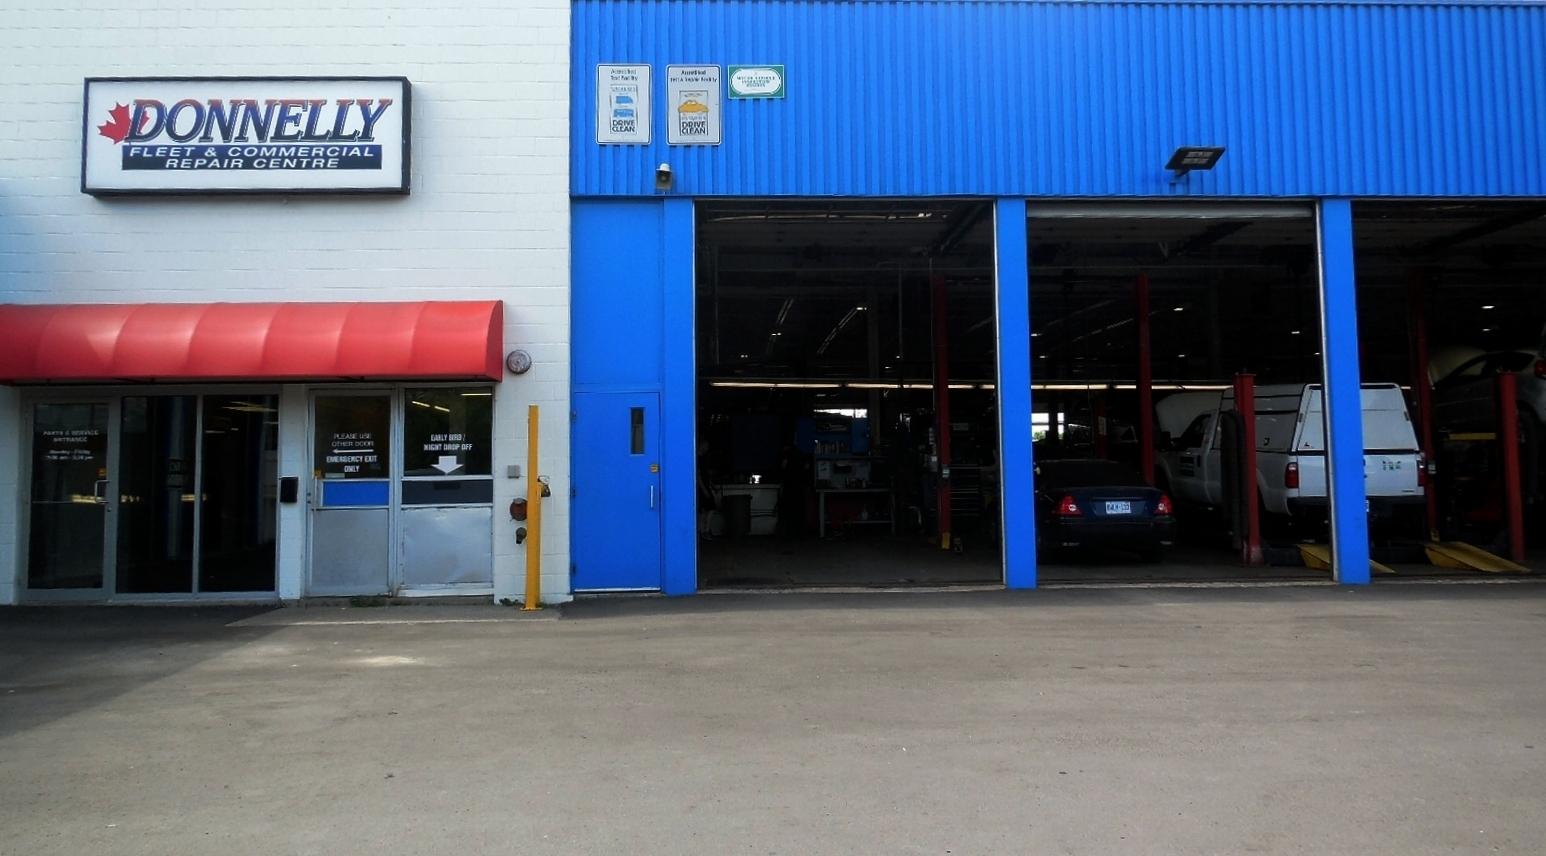 Fleet & Commercial Service